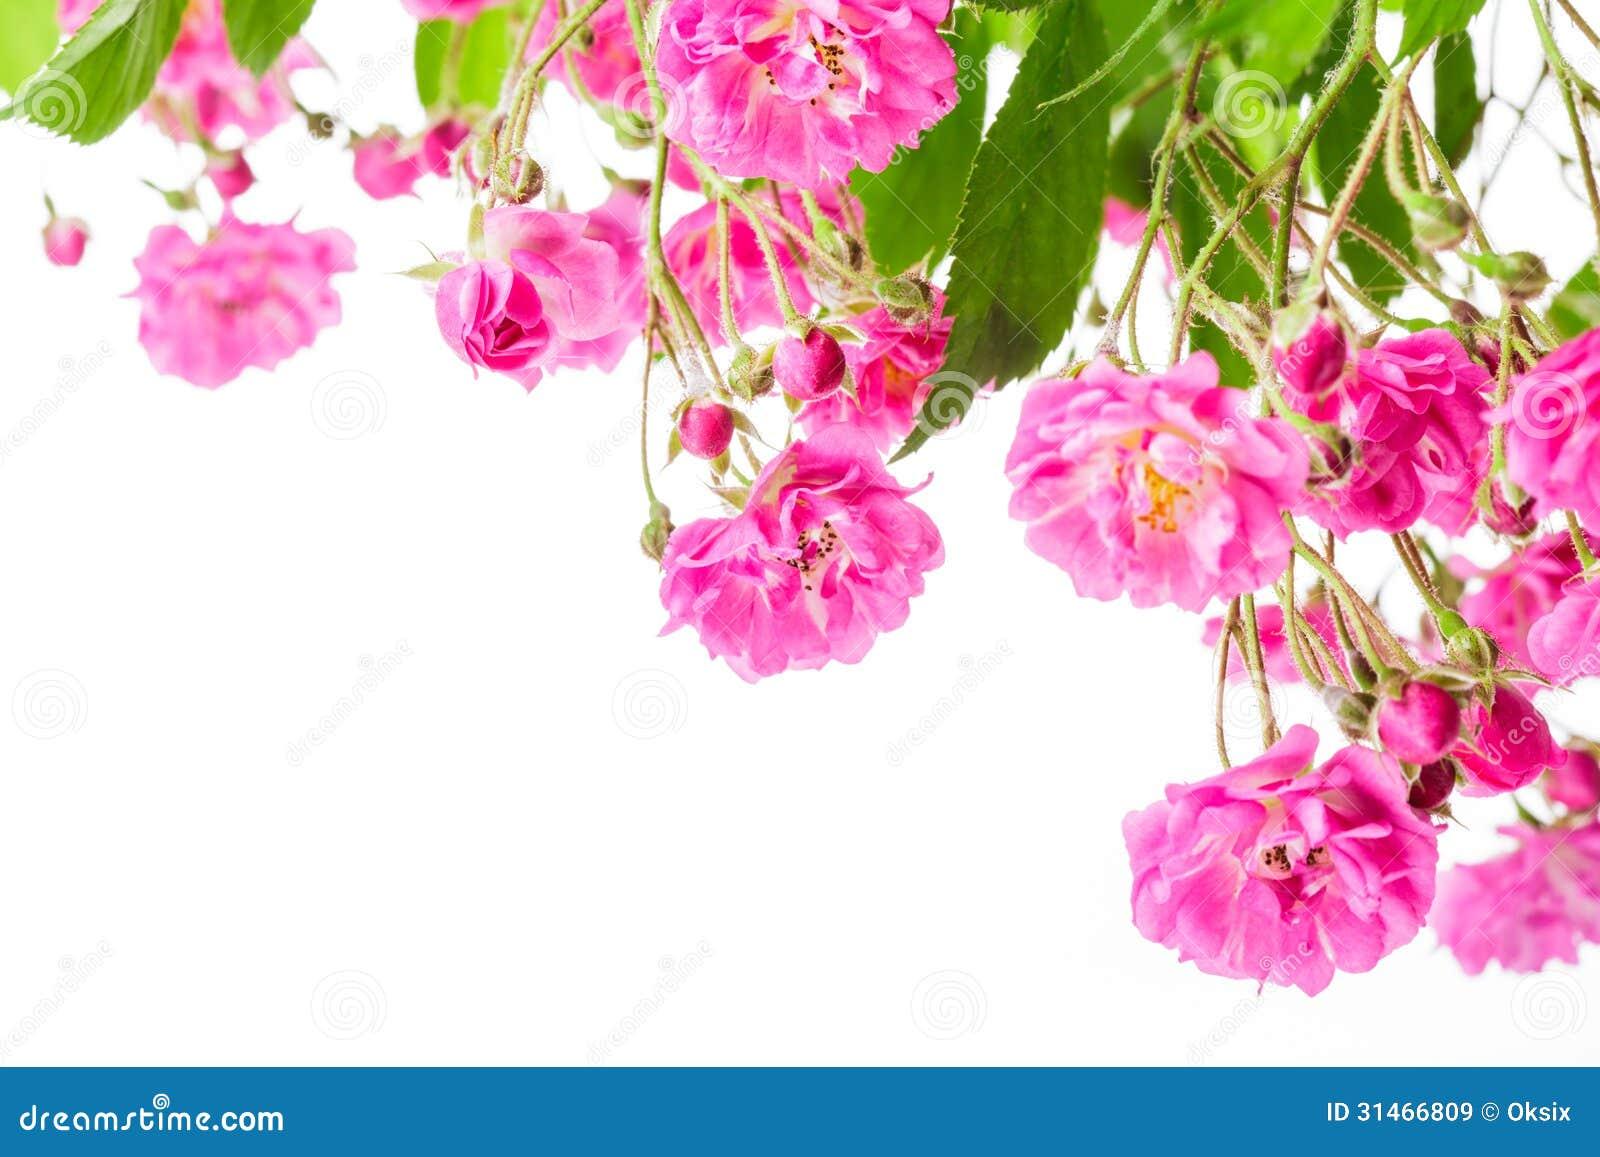 Pink Rose Bush Stock Image Image Of Flower Isolated